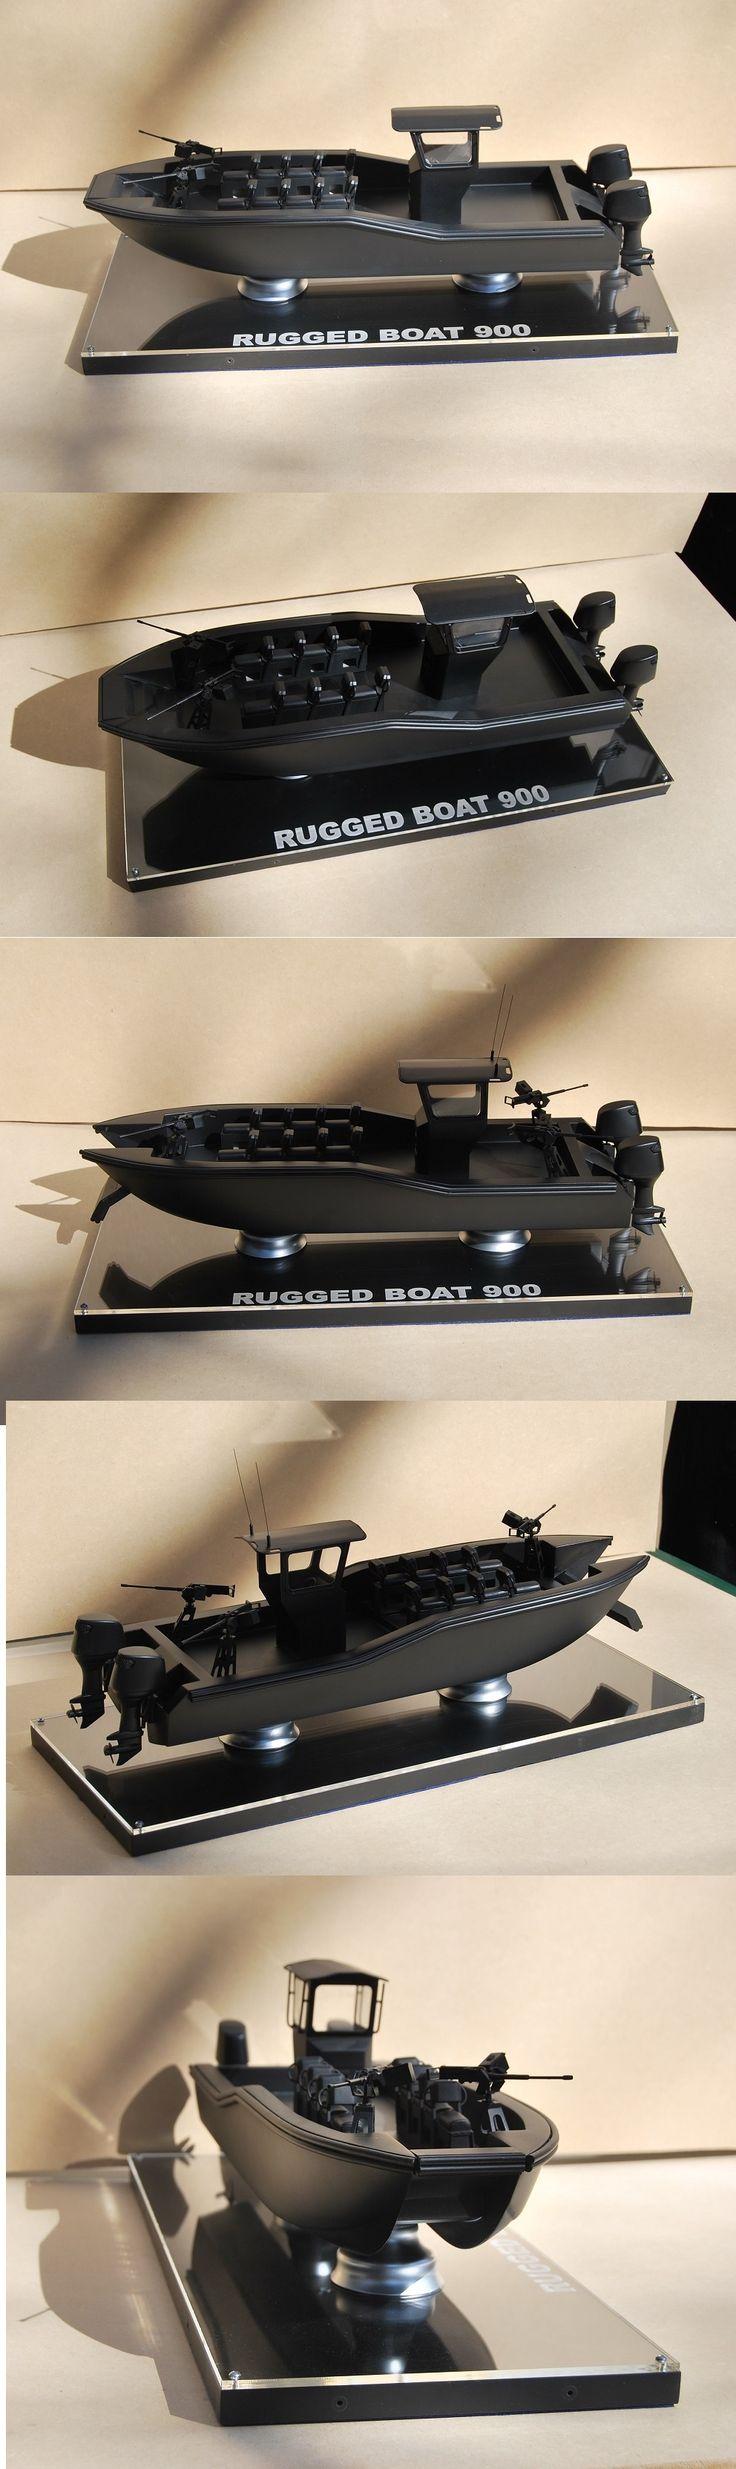 Rugged Boat Scale model